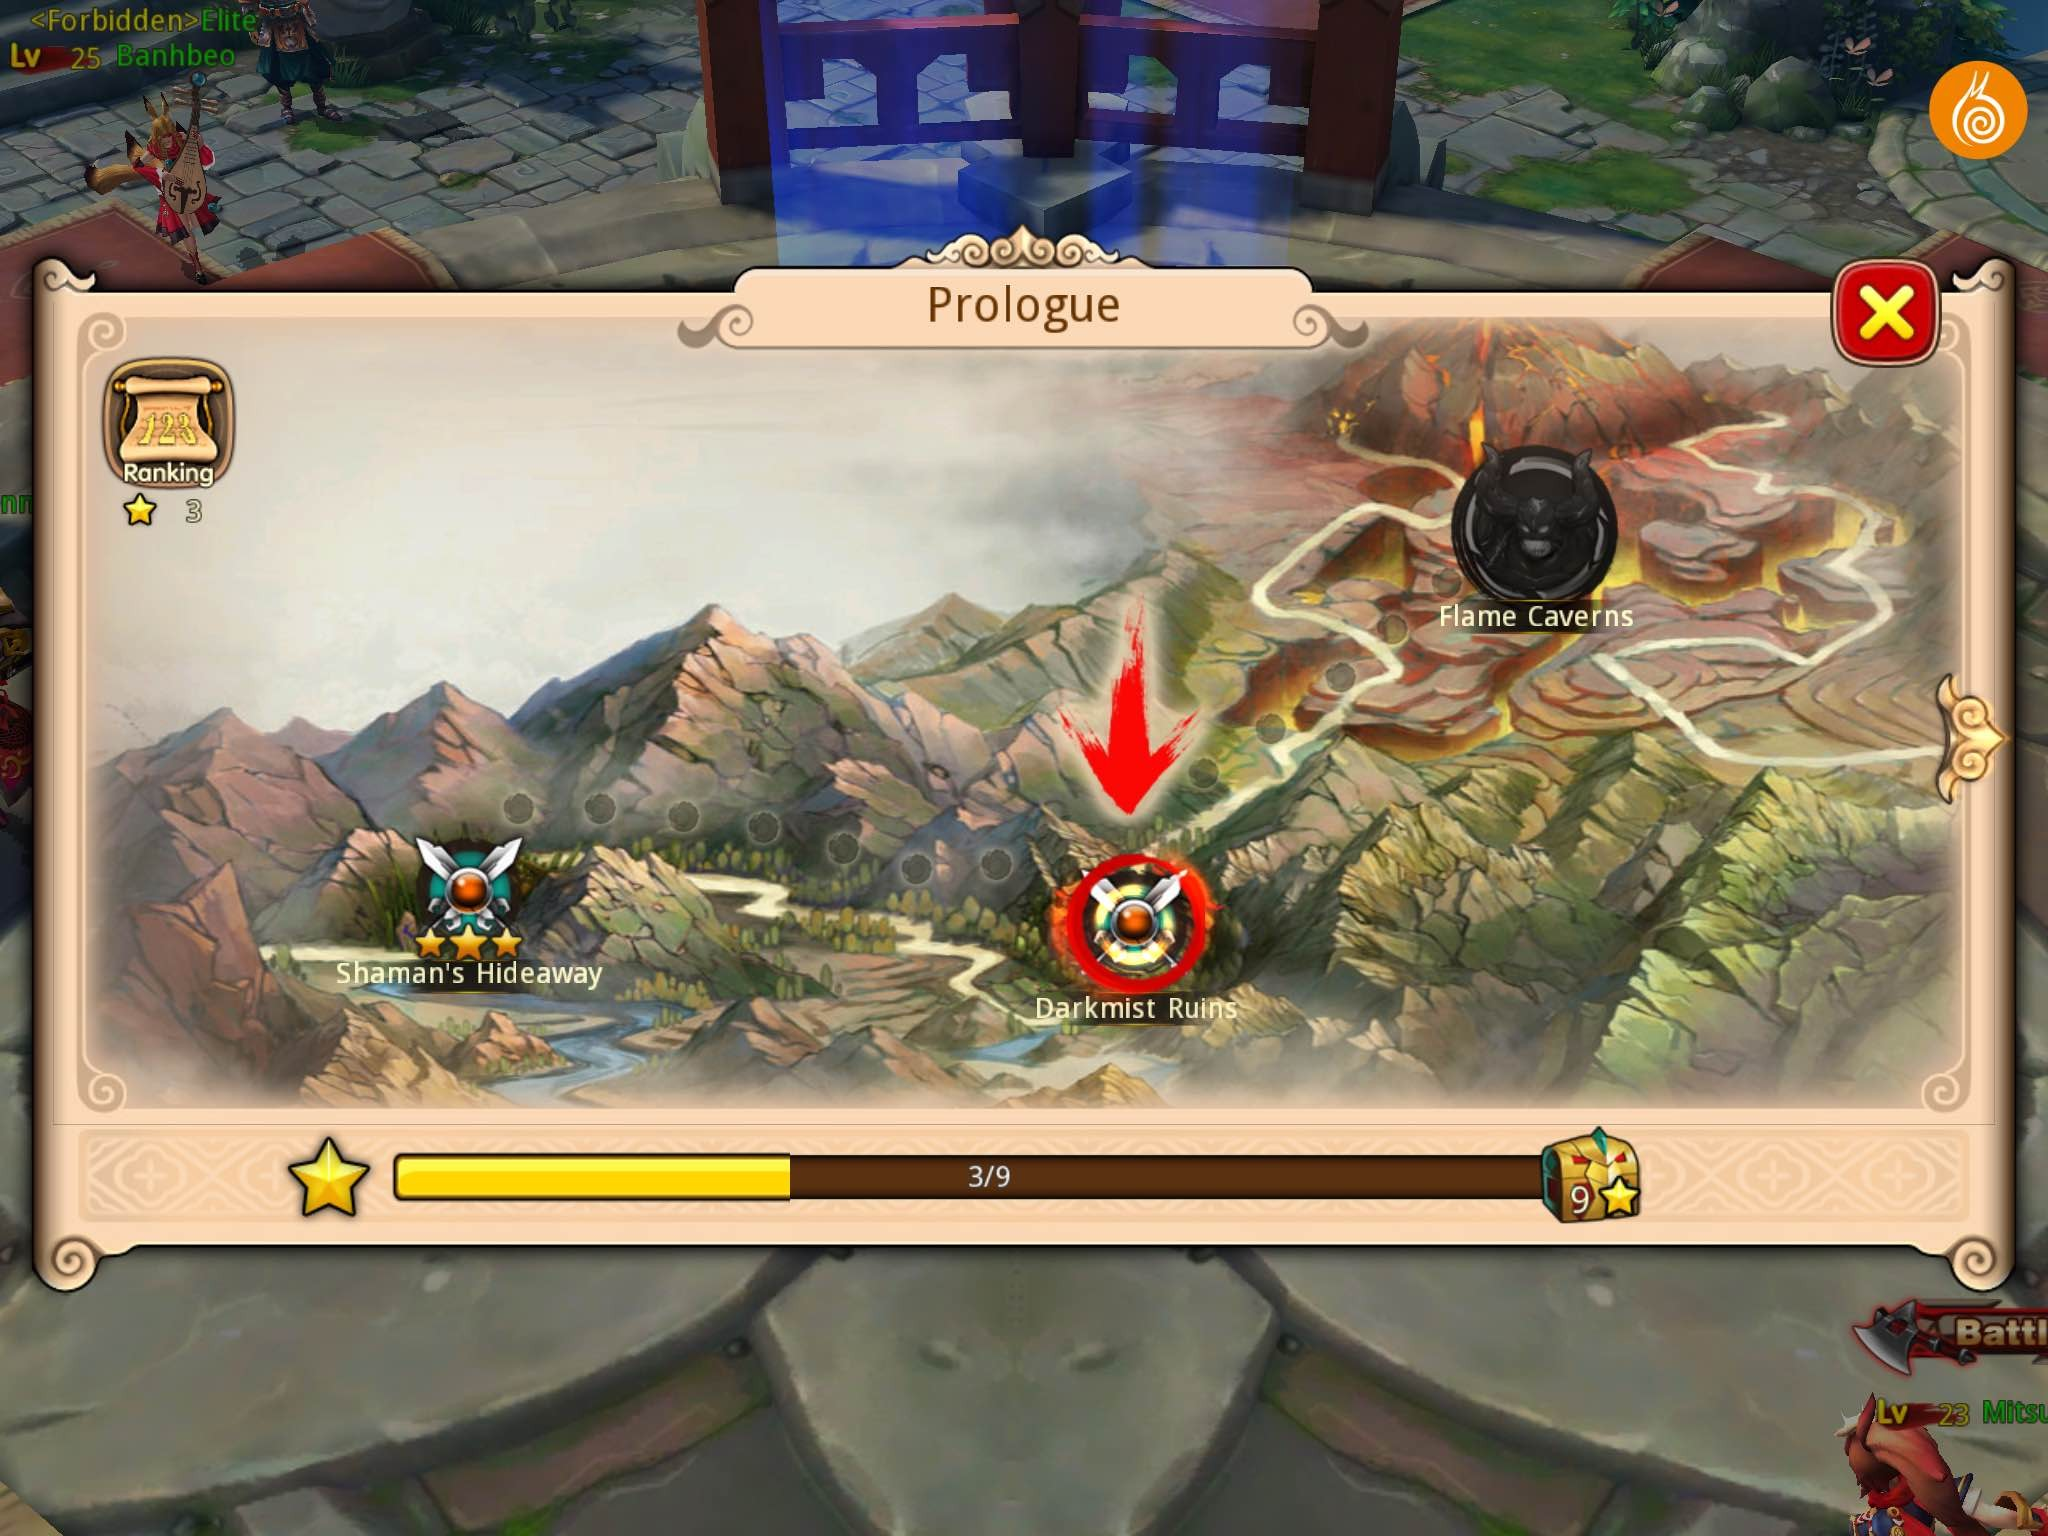 Taichi Panda: Heroes (Taichi Panda 2) Closed Beta Preview